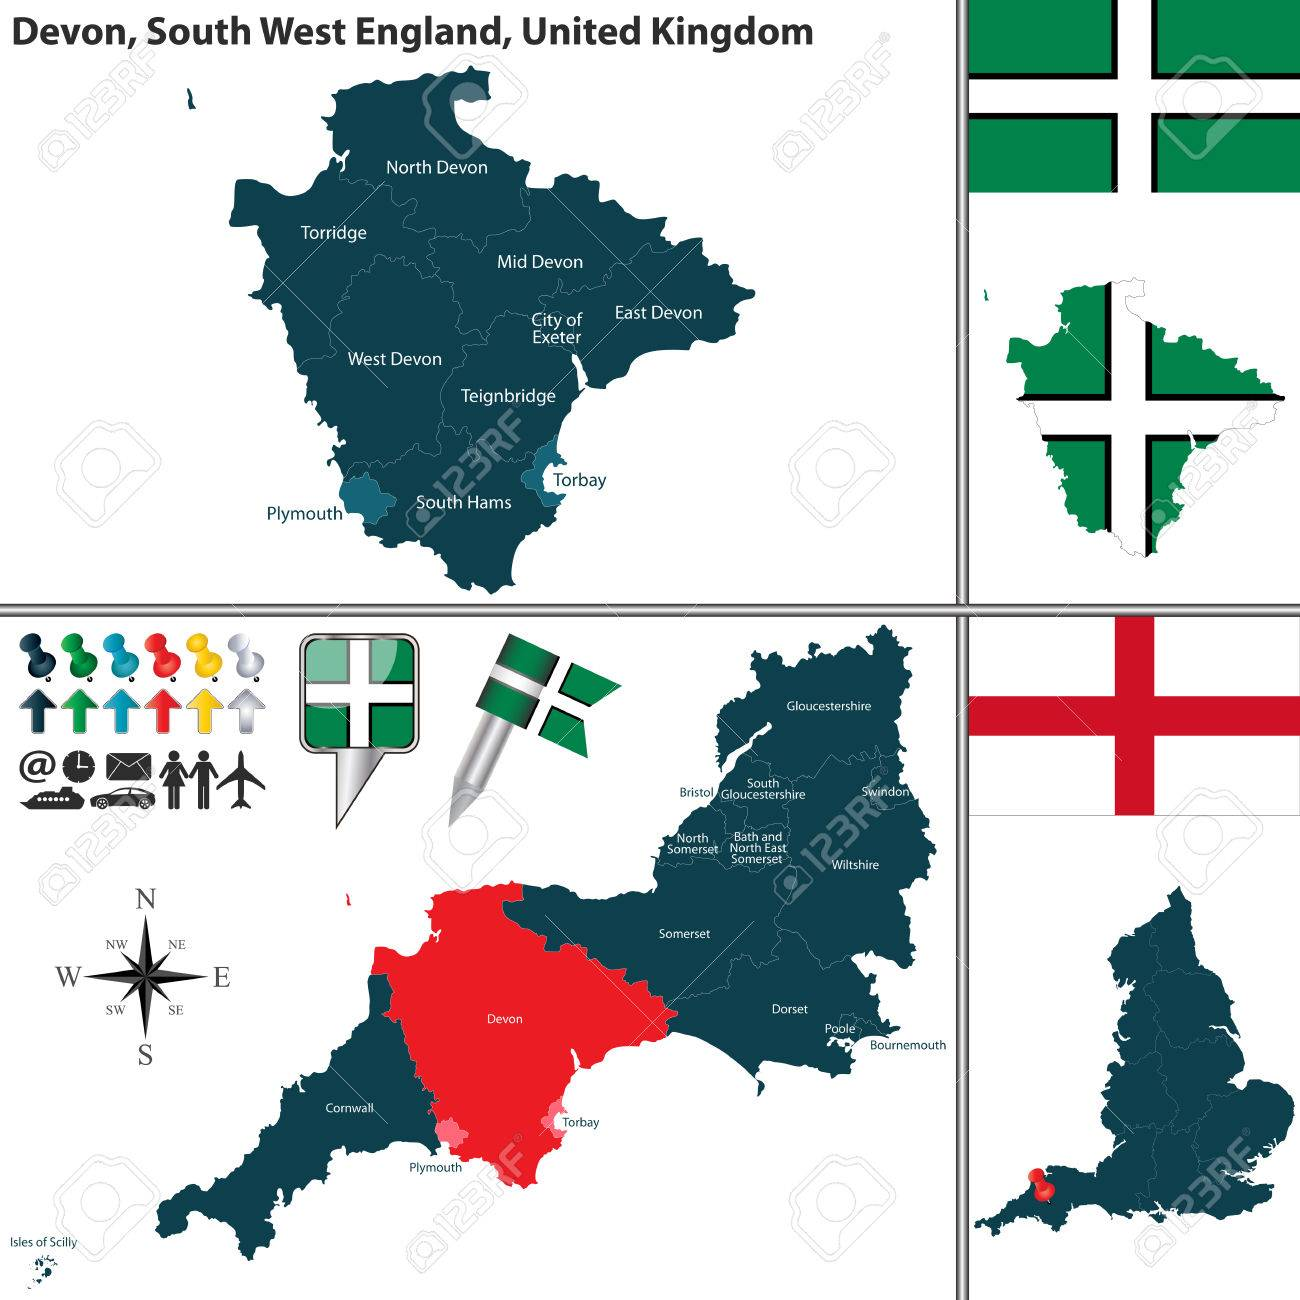 South Devon England Map.Map Of Devon In South West England United Kingdom With Regions